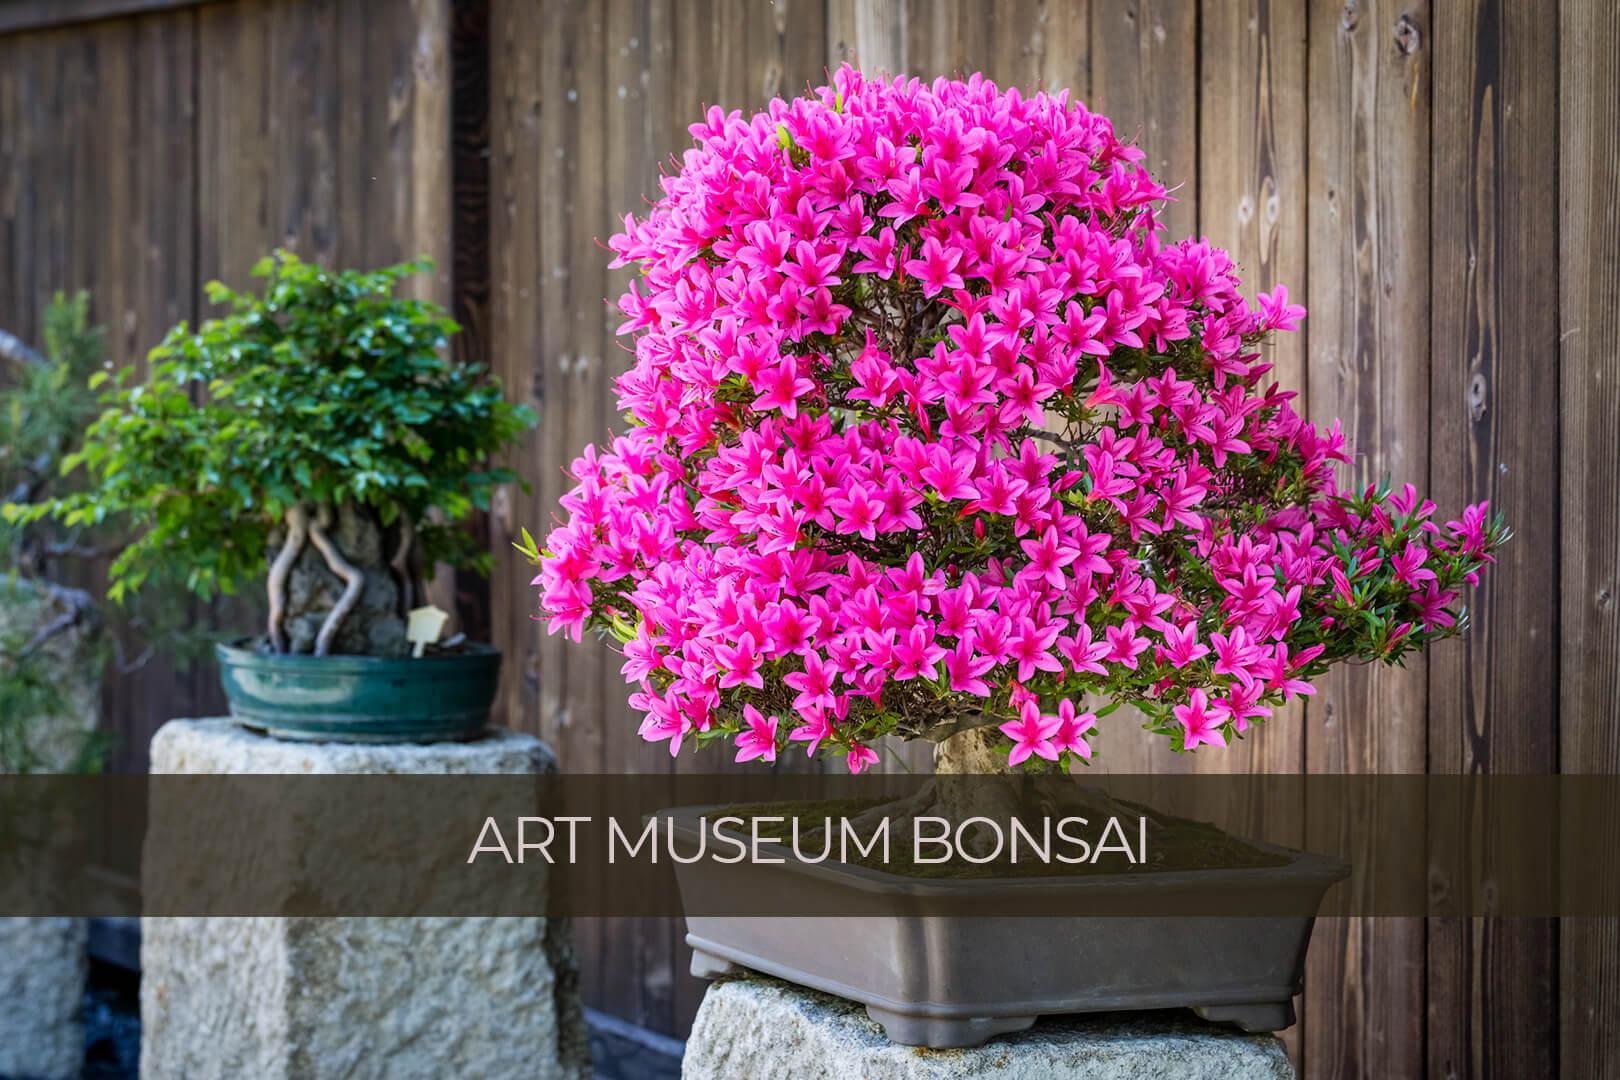 bonsai poprawione